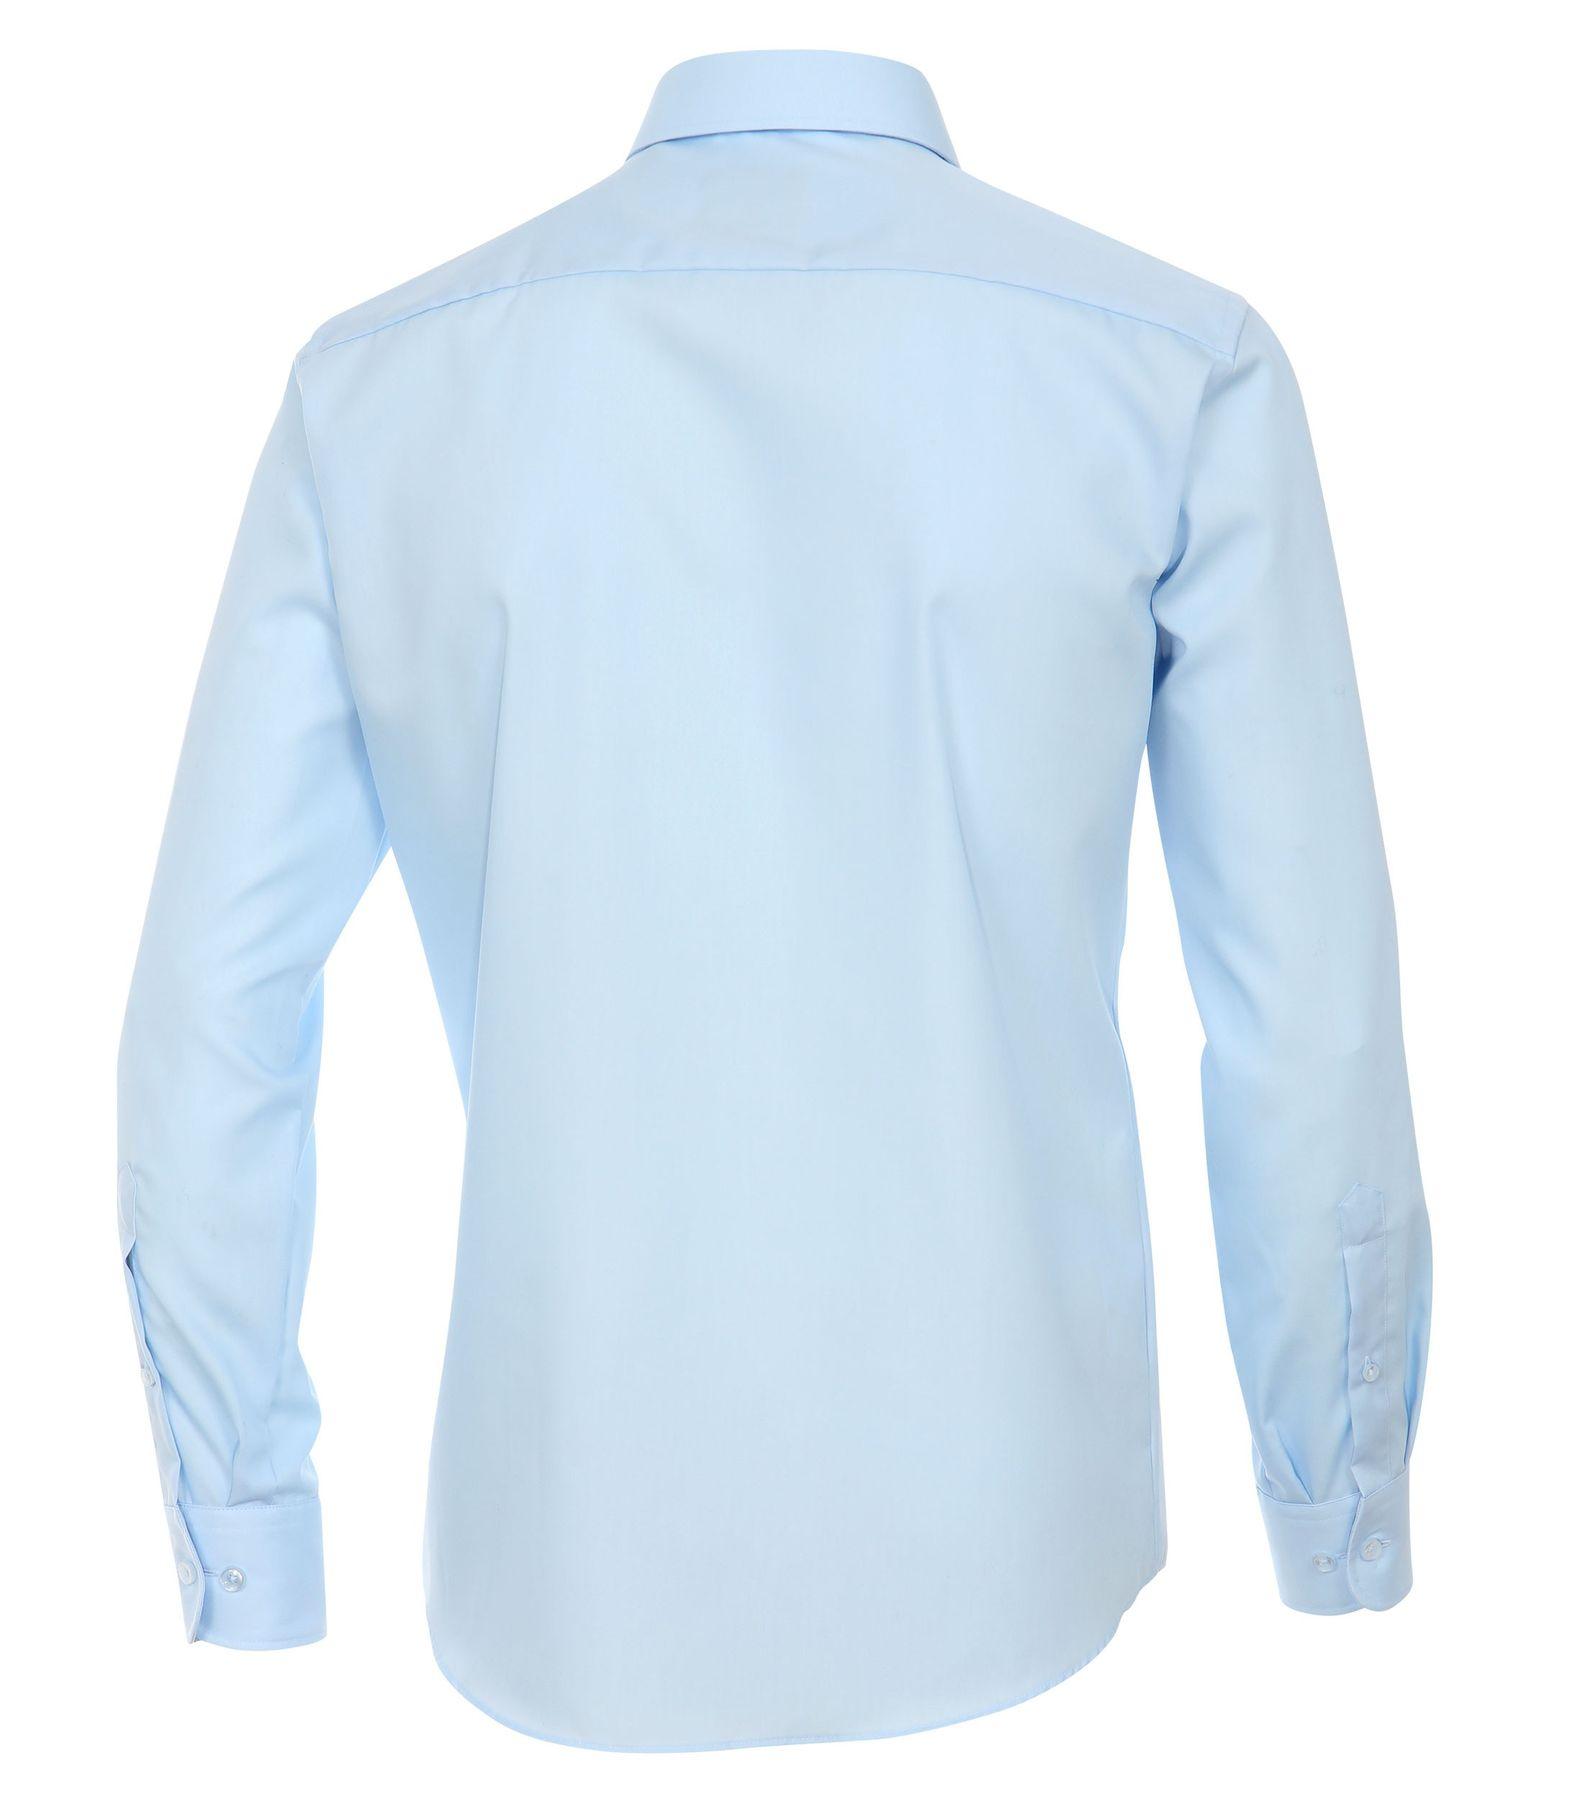 Casa Moda - Modern Fit - Bügelfreies Herren Business langarm Hemd in verschiedene Farben (006550) – Bild 12